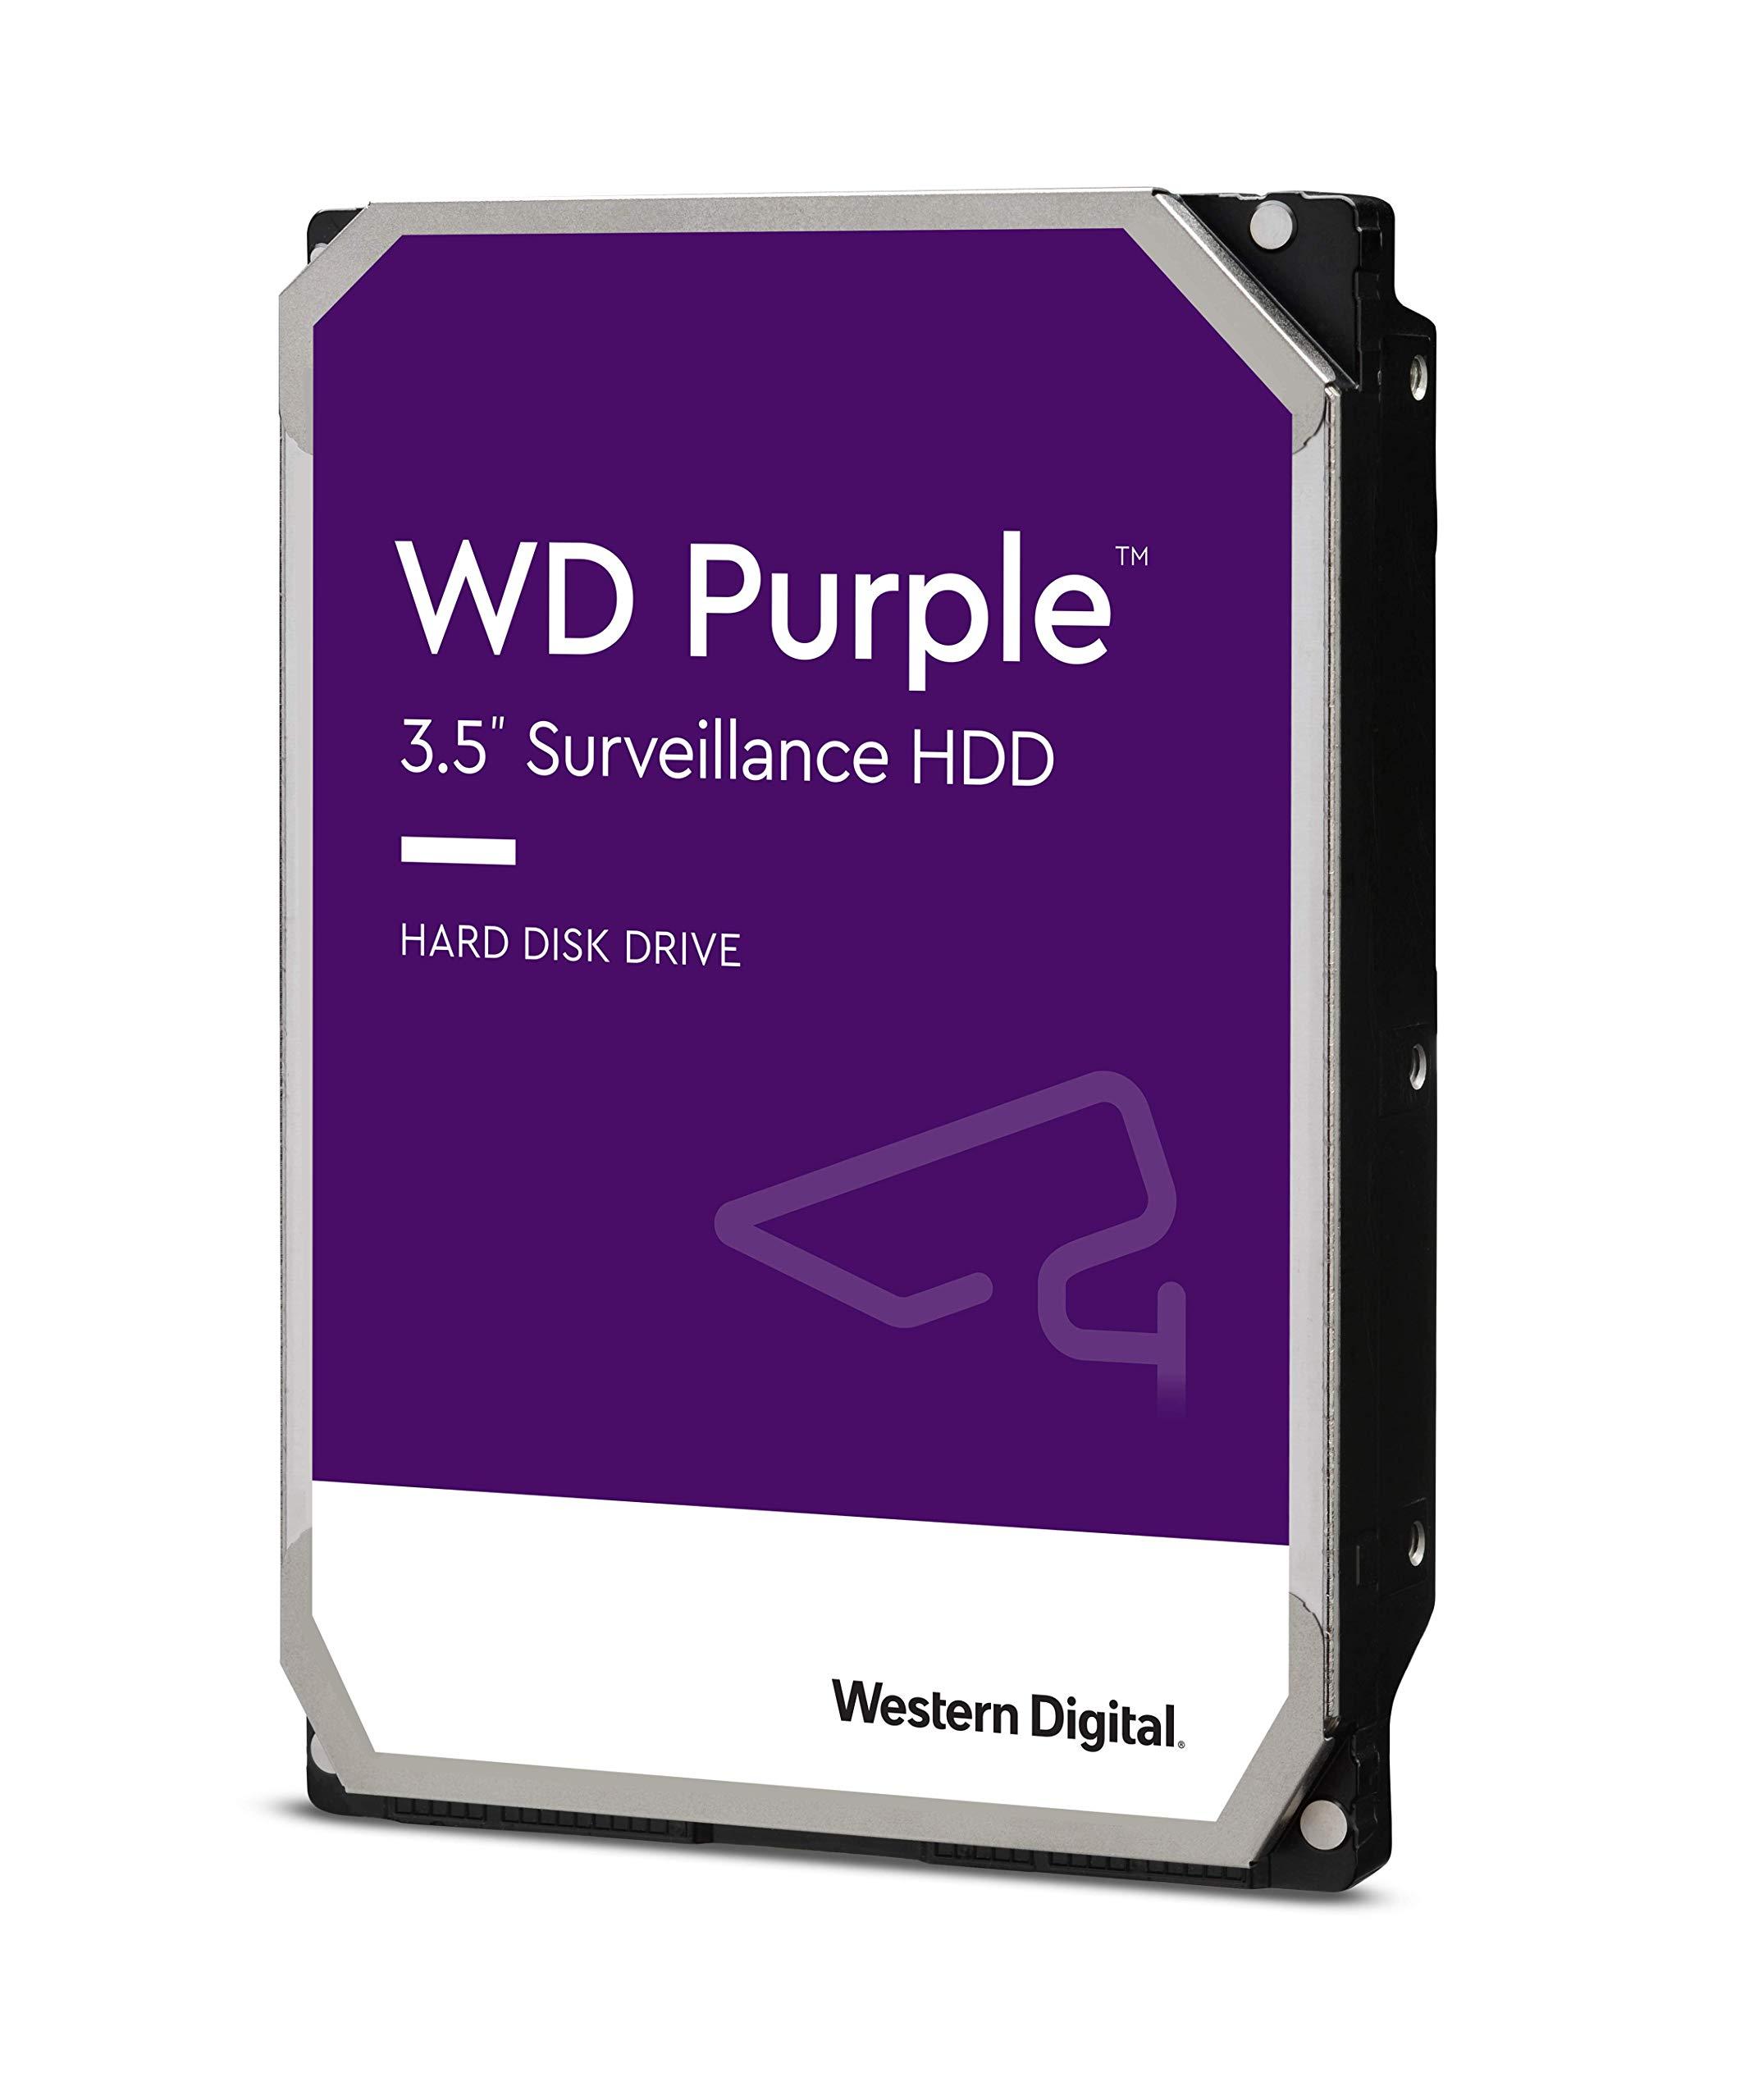 Western Digital Purple 4TB Surveillance 3.5 Inch SATA 6 Gb/s Hard Disk Drive with Allframe 4K Technology - 180TB/yr, 64MB Cache, 5400rpm - WD40PURZ